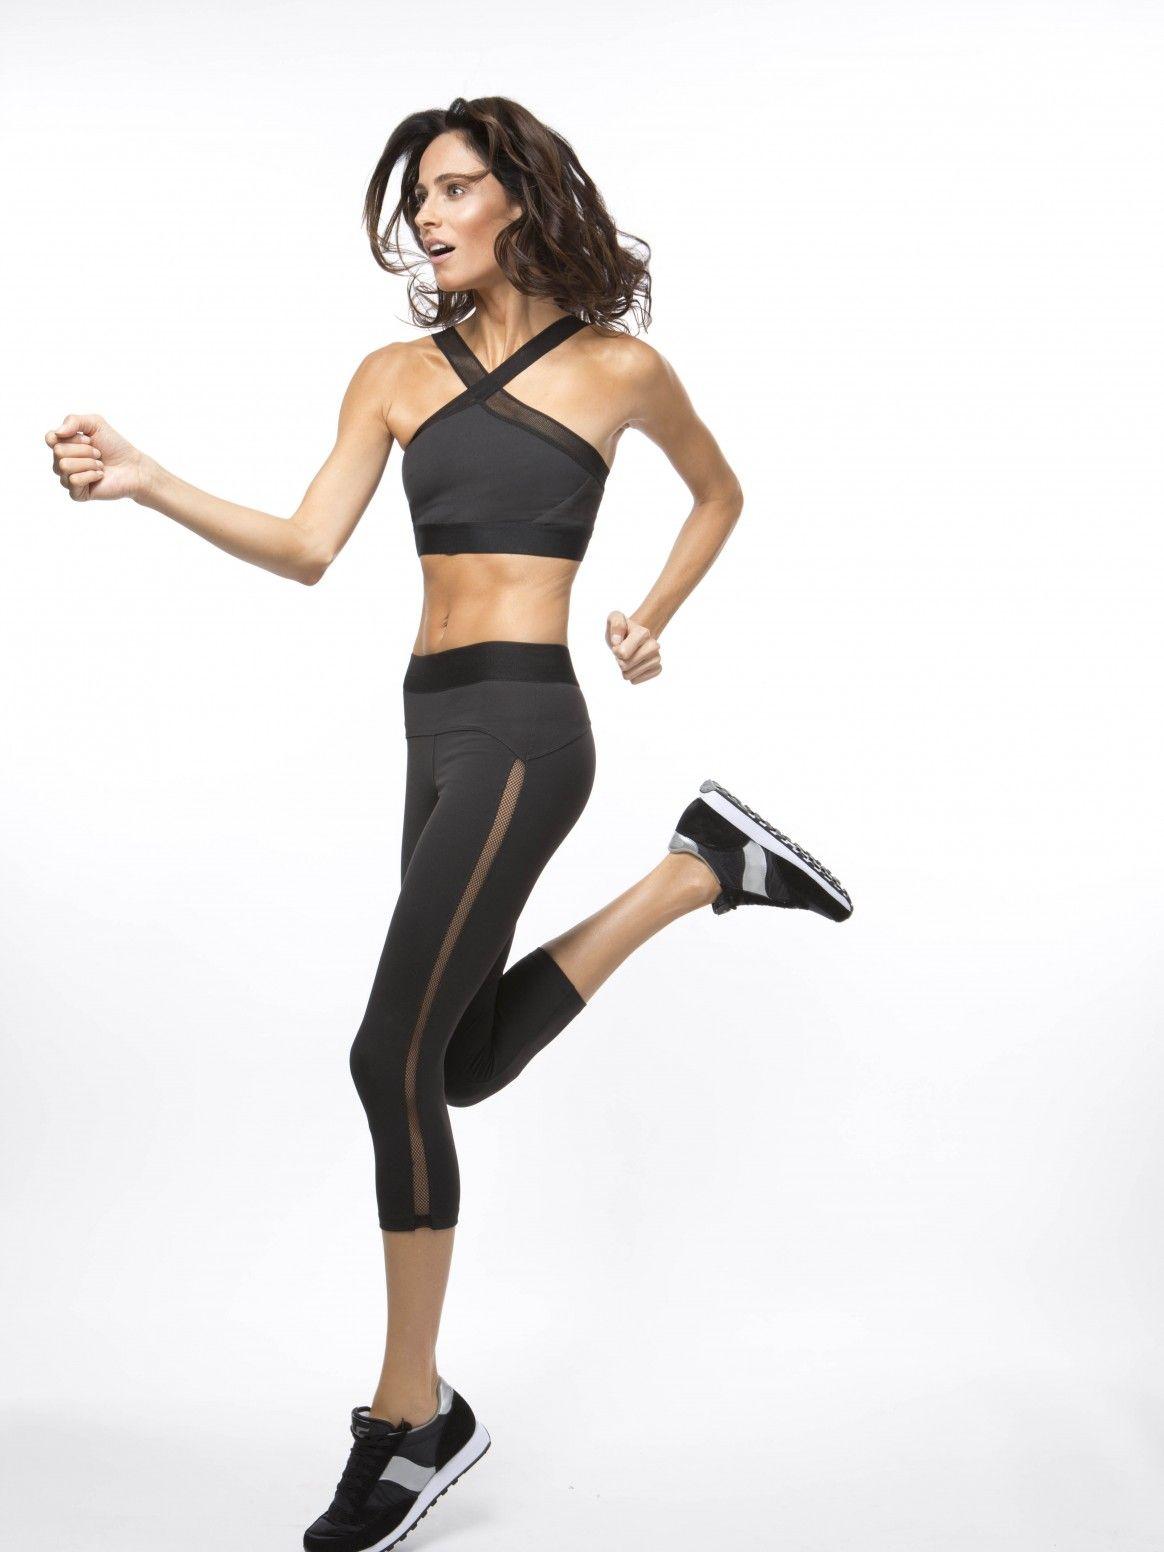 Heroine Sport X Bra Fashercise, Activewear for the